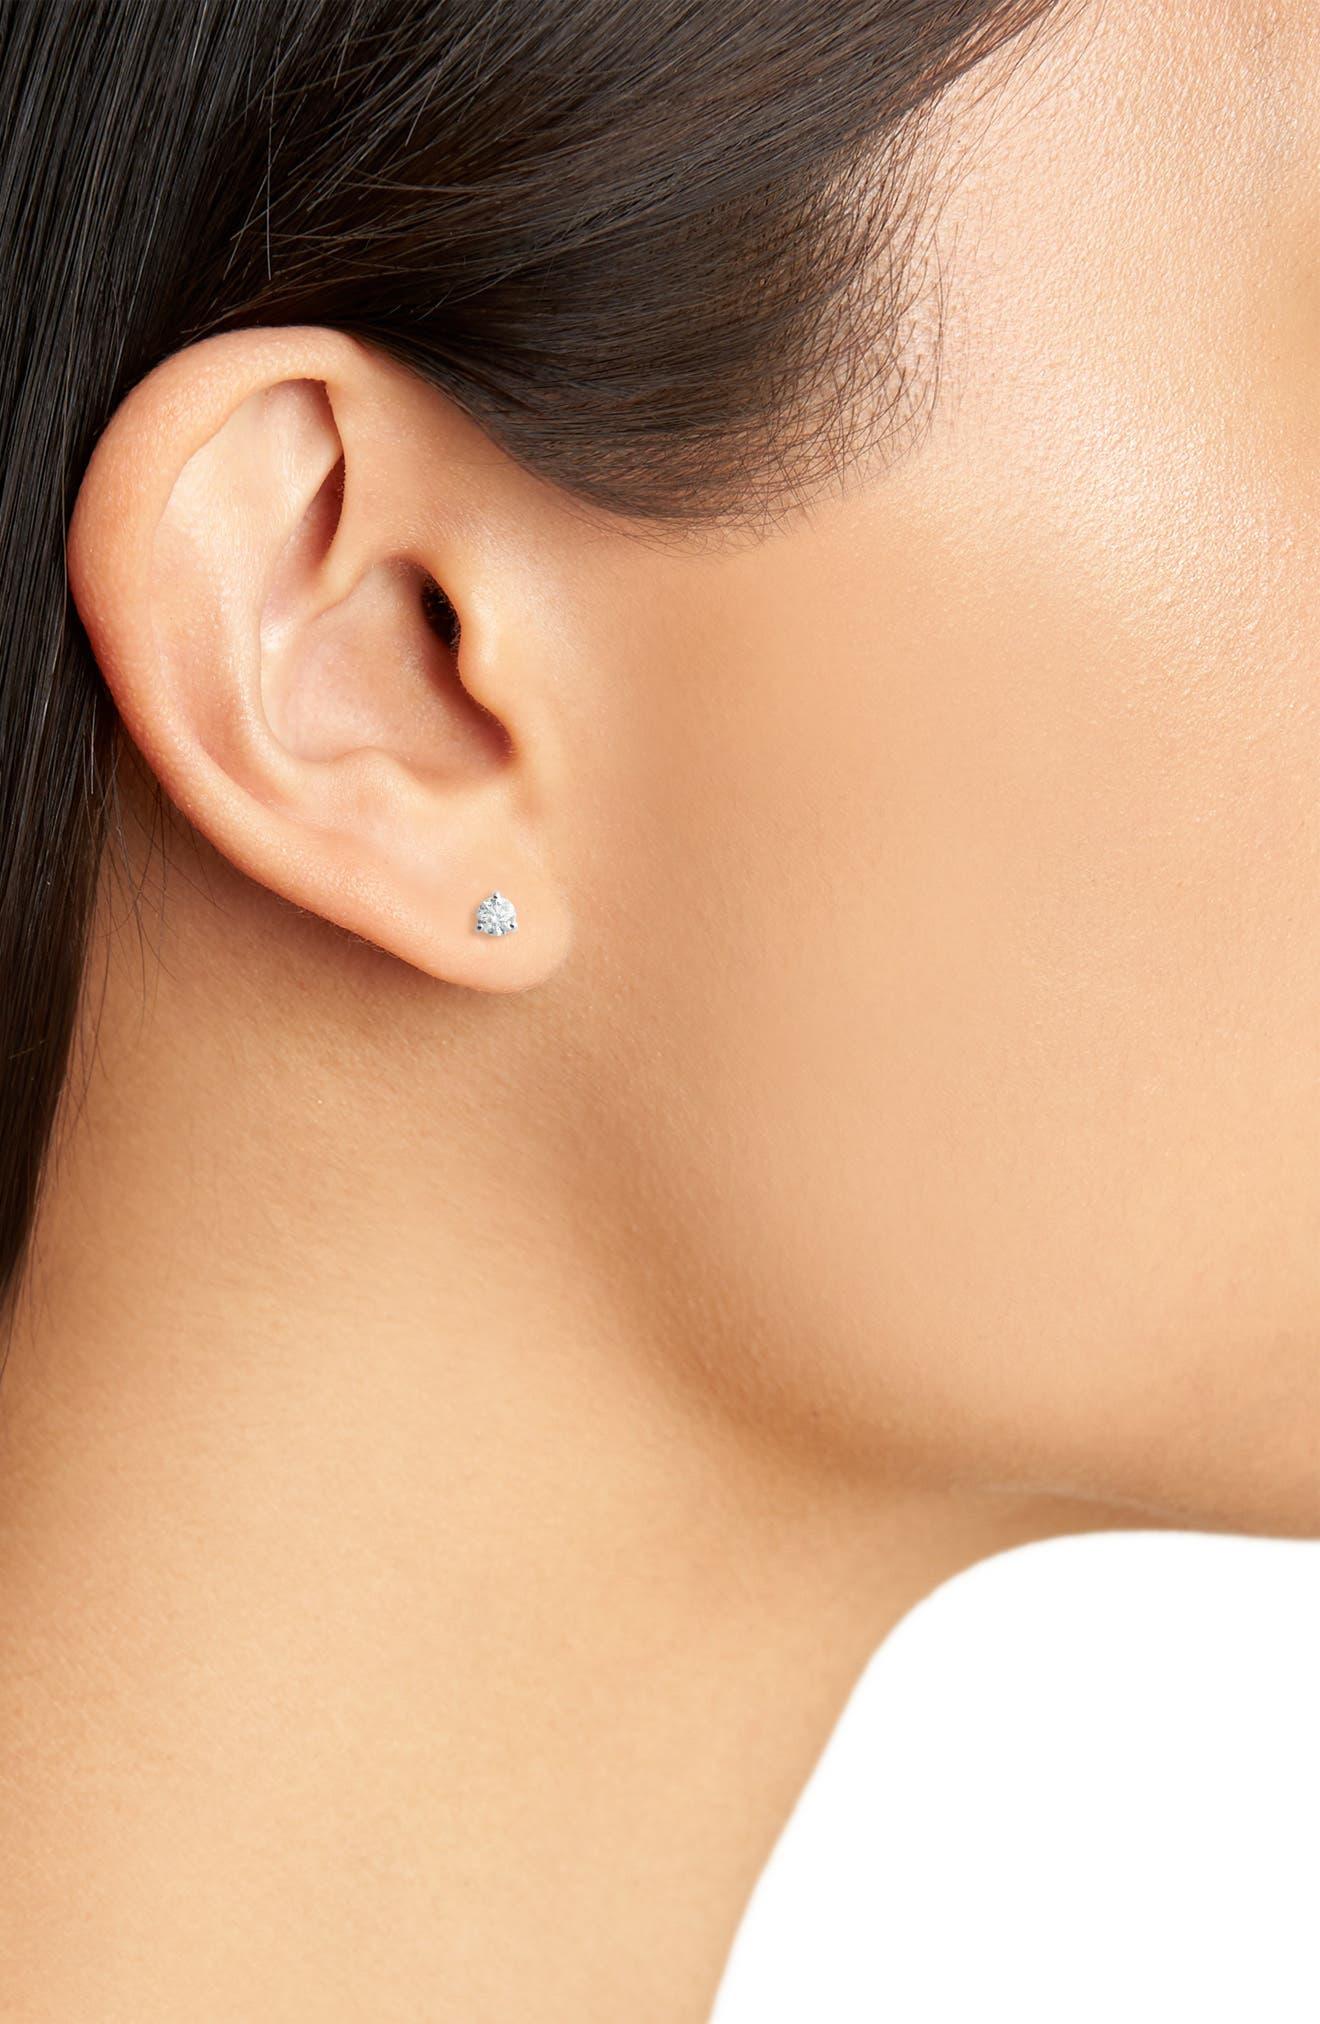 Single Diamond Stud Earring,                             Alternate thumbnail 2, color,                             WHITE GOLD 2